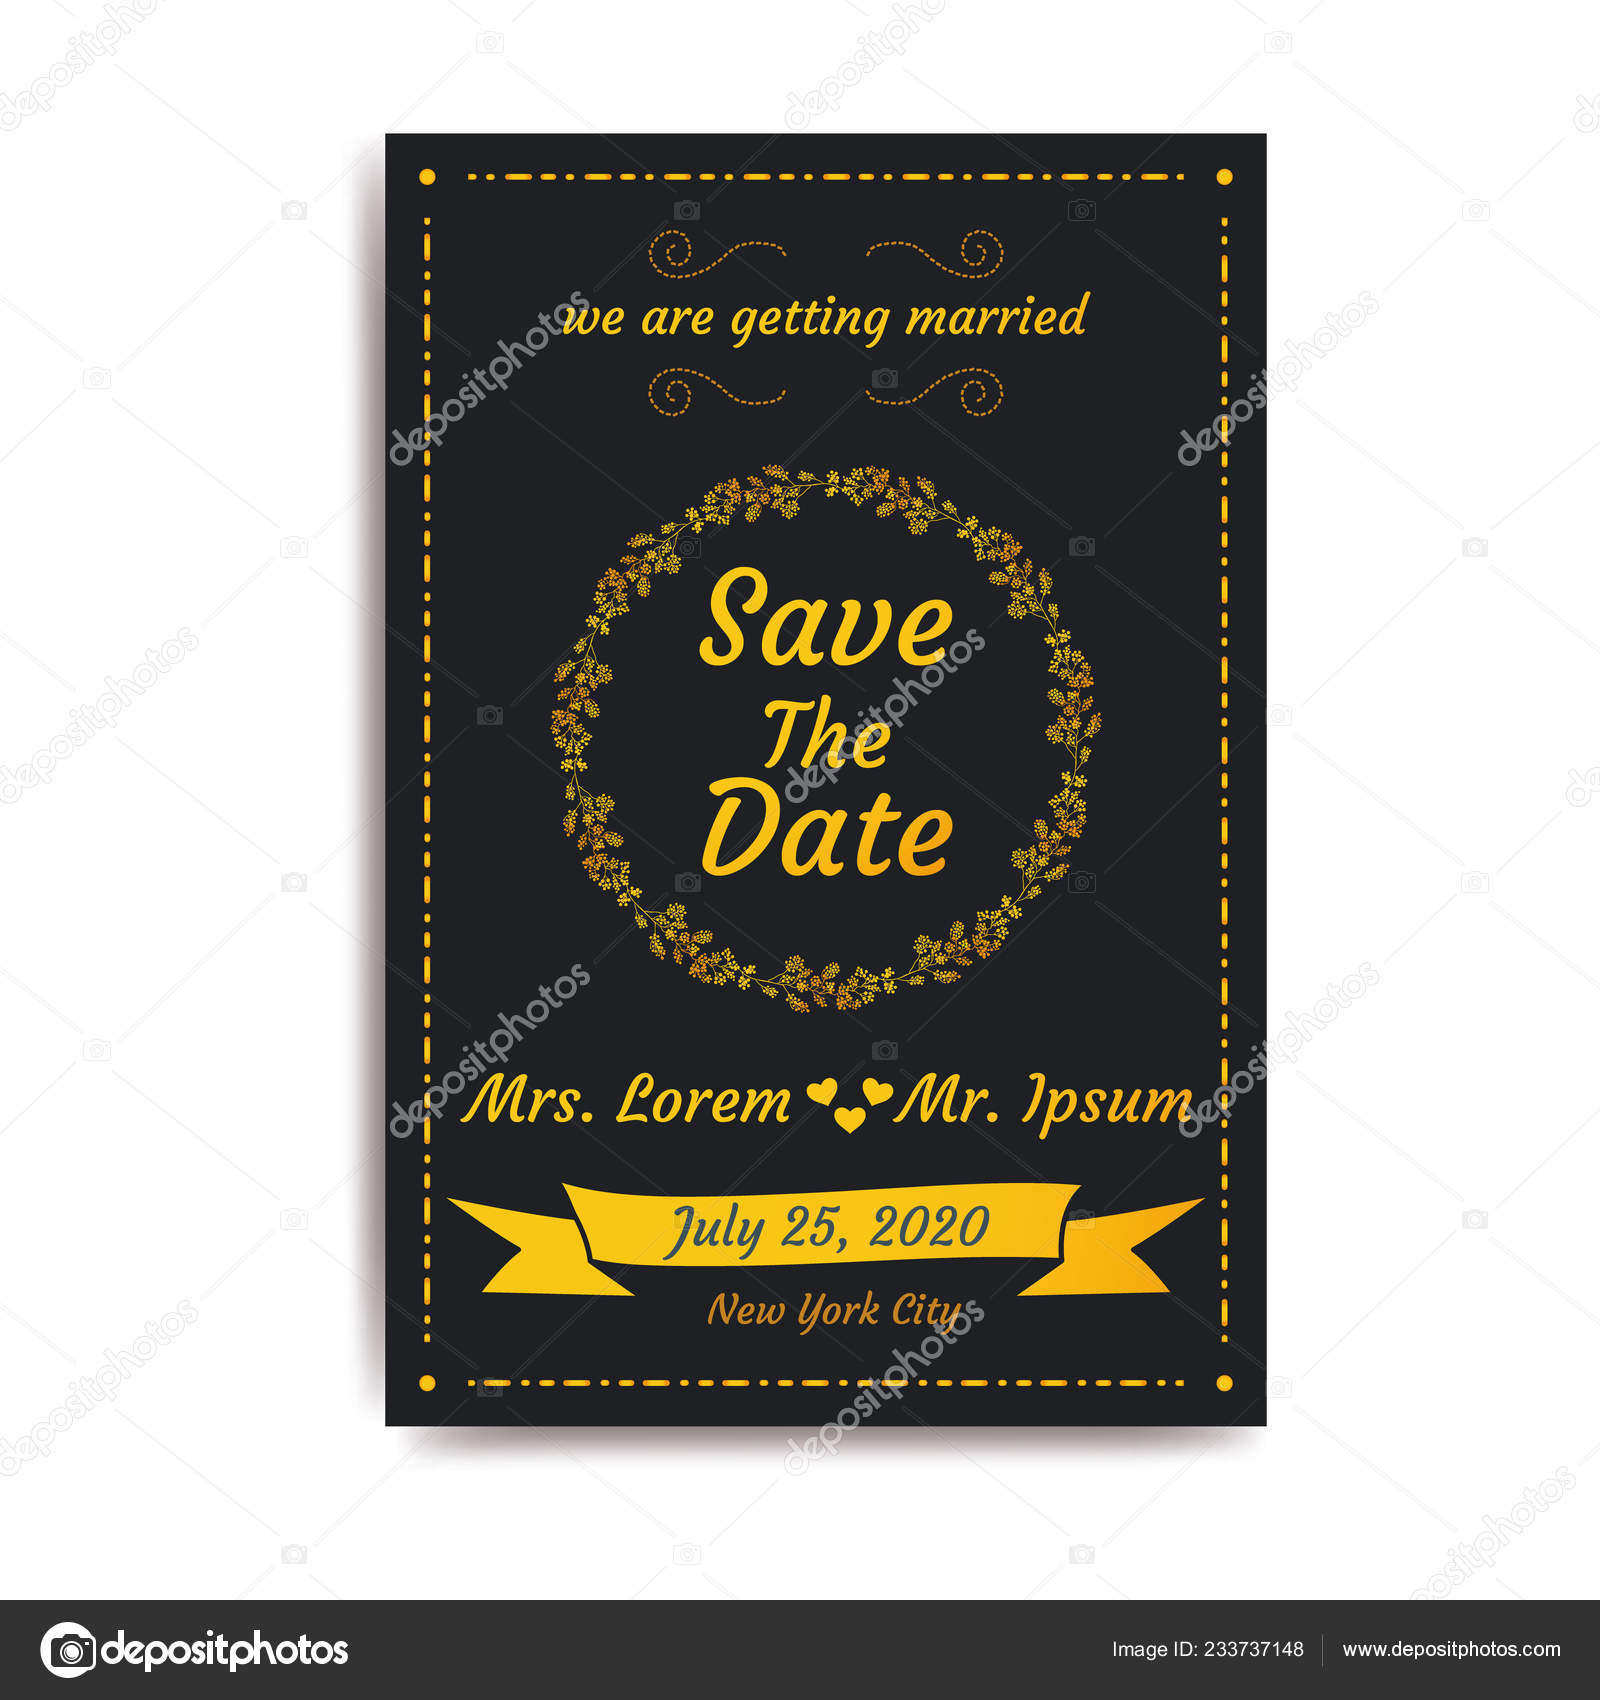 Wedding Date Invitation Card Black Background Vector